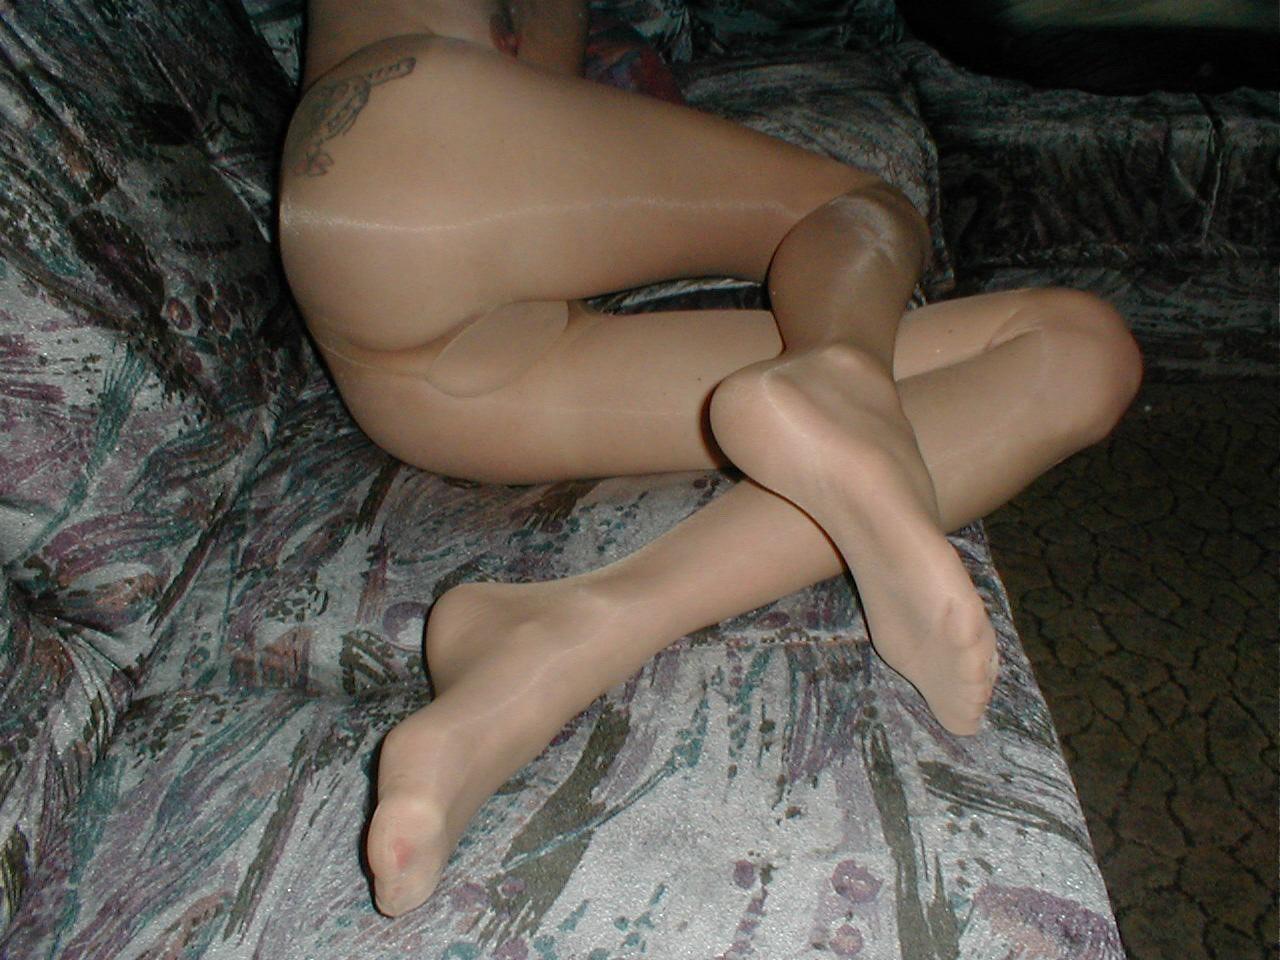 http://pbs-2.adult-empire.com/85/8570/021/pic/8.jpg